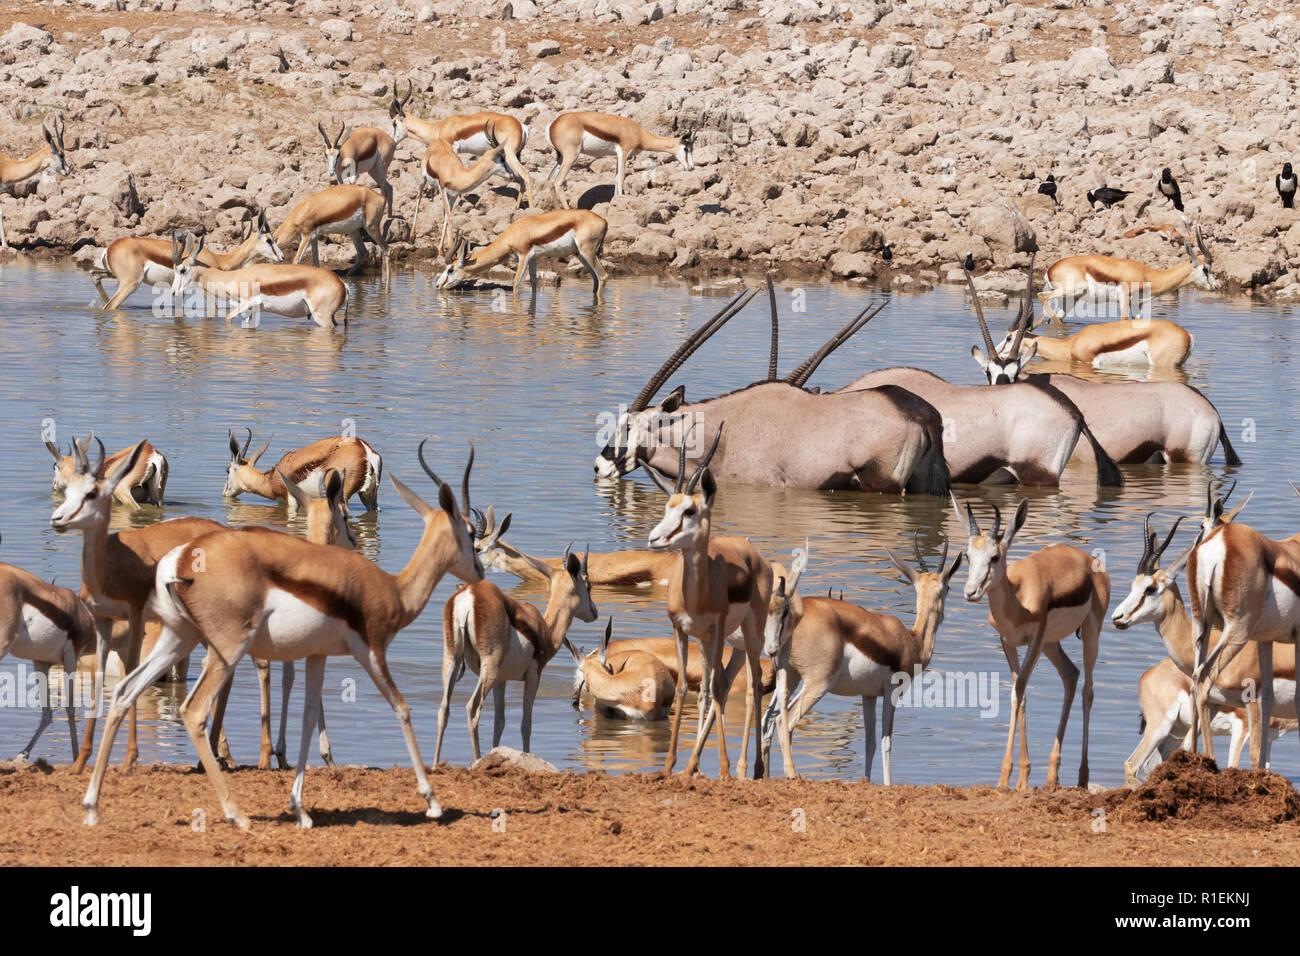 Namibia wildlife - herbivores around waterhole,including springbok, ,and oryx, Okaukuejo camp, Etosha national park, Namibia Africa Stock Photo